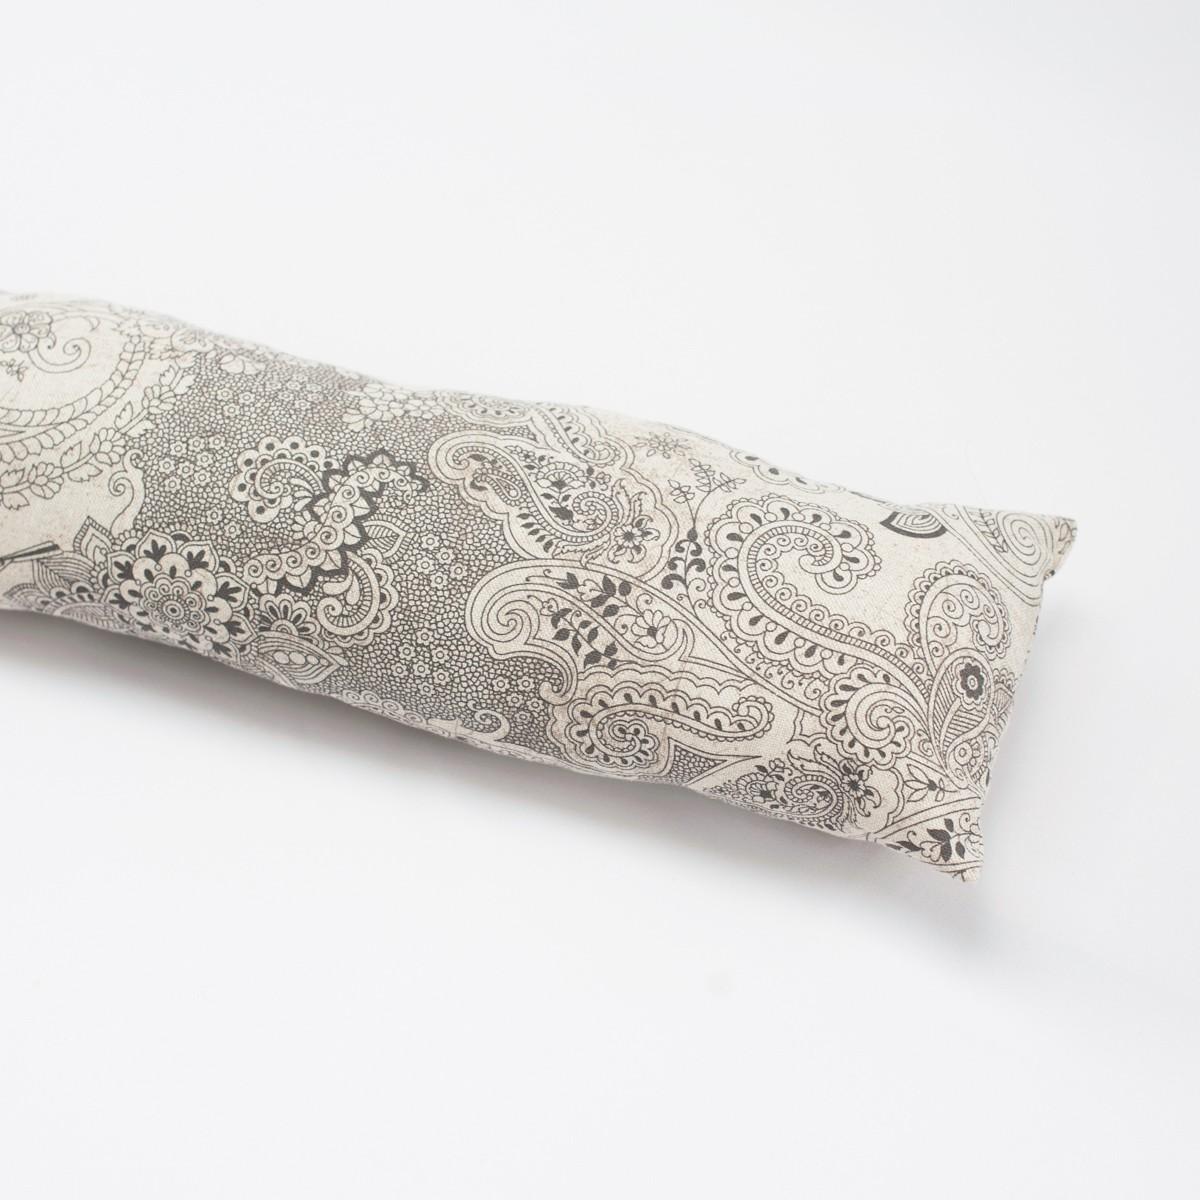 zugluftstopper mit paisleymuster 80 bis 130cm lang wohntextilien kissen zugluftstopper. Black Bedroom Furniture Sets. Home Design Ideas